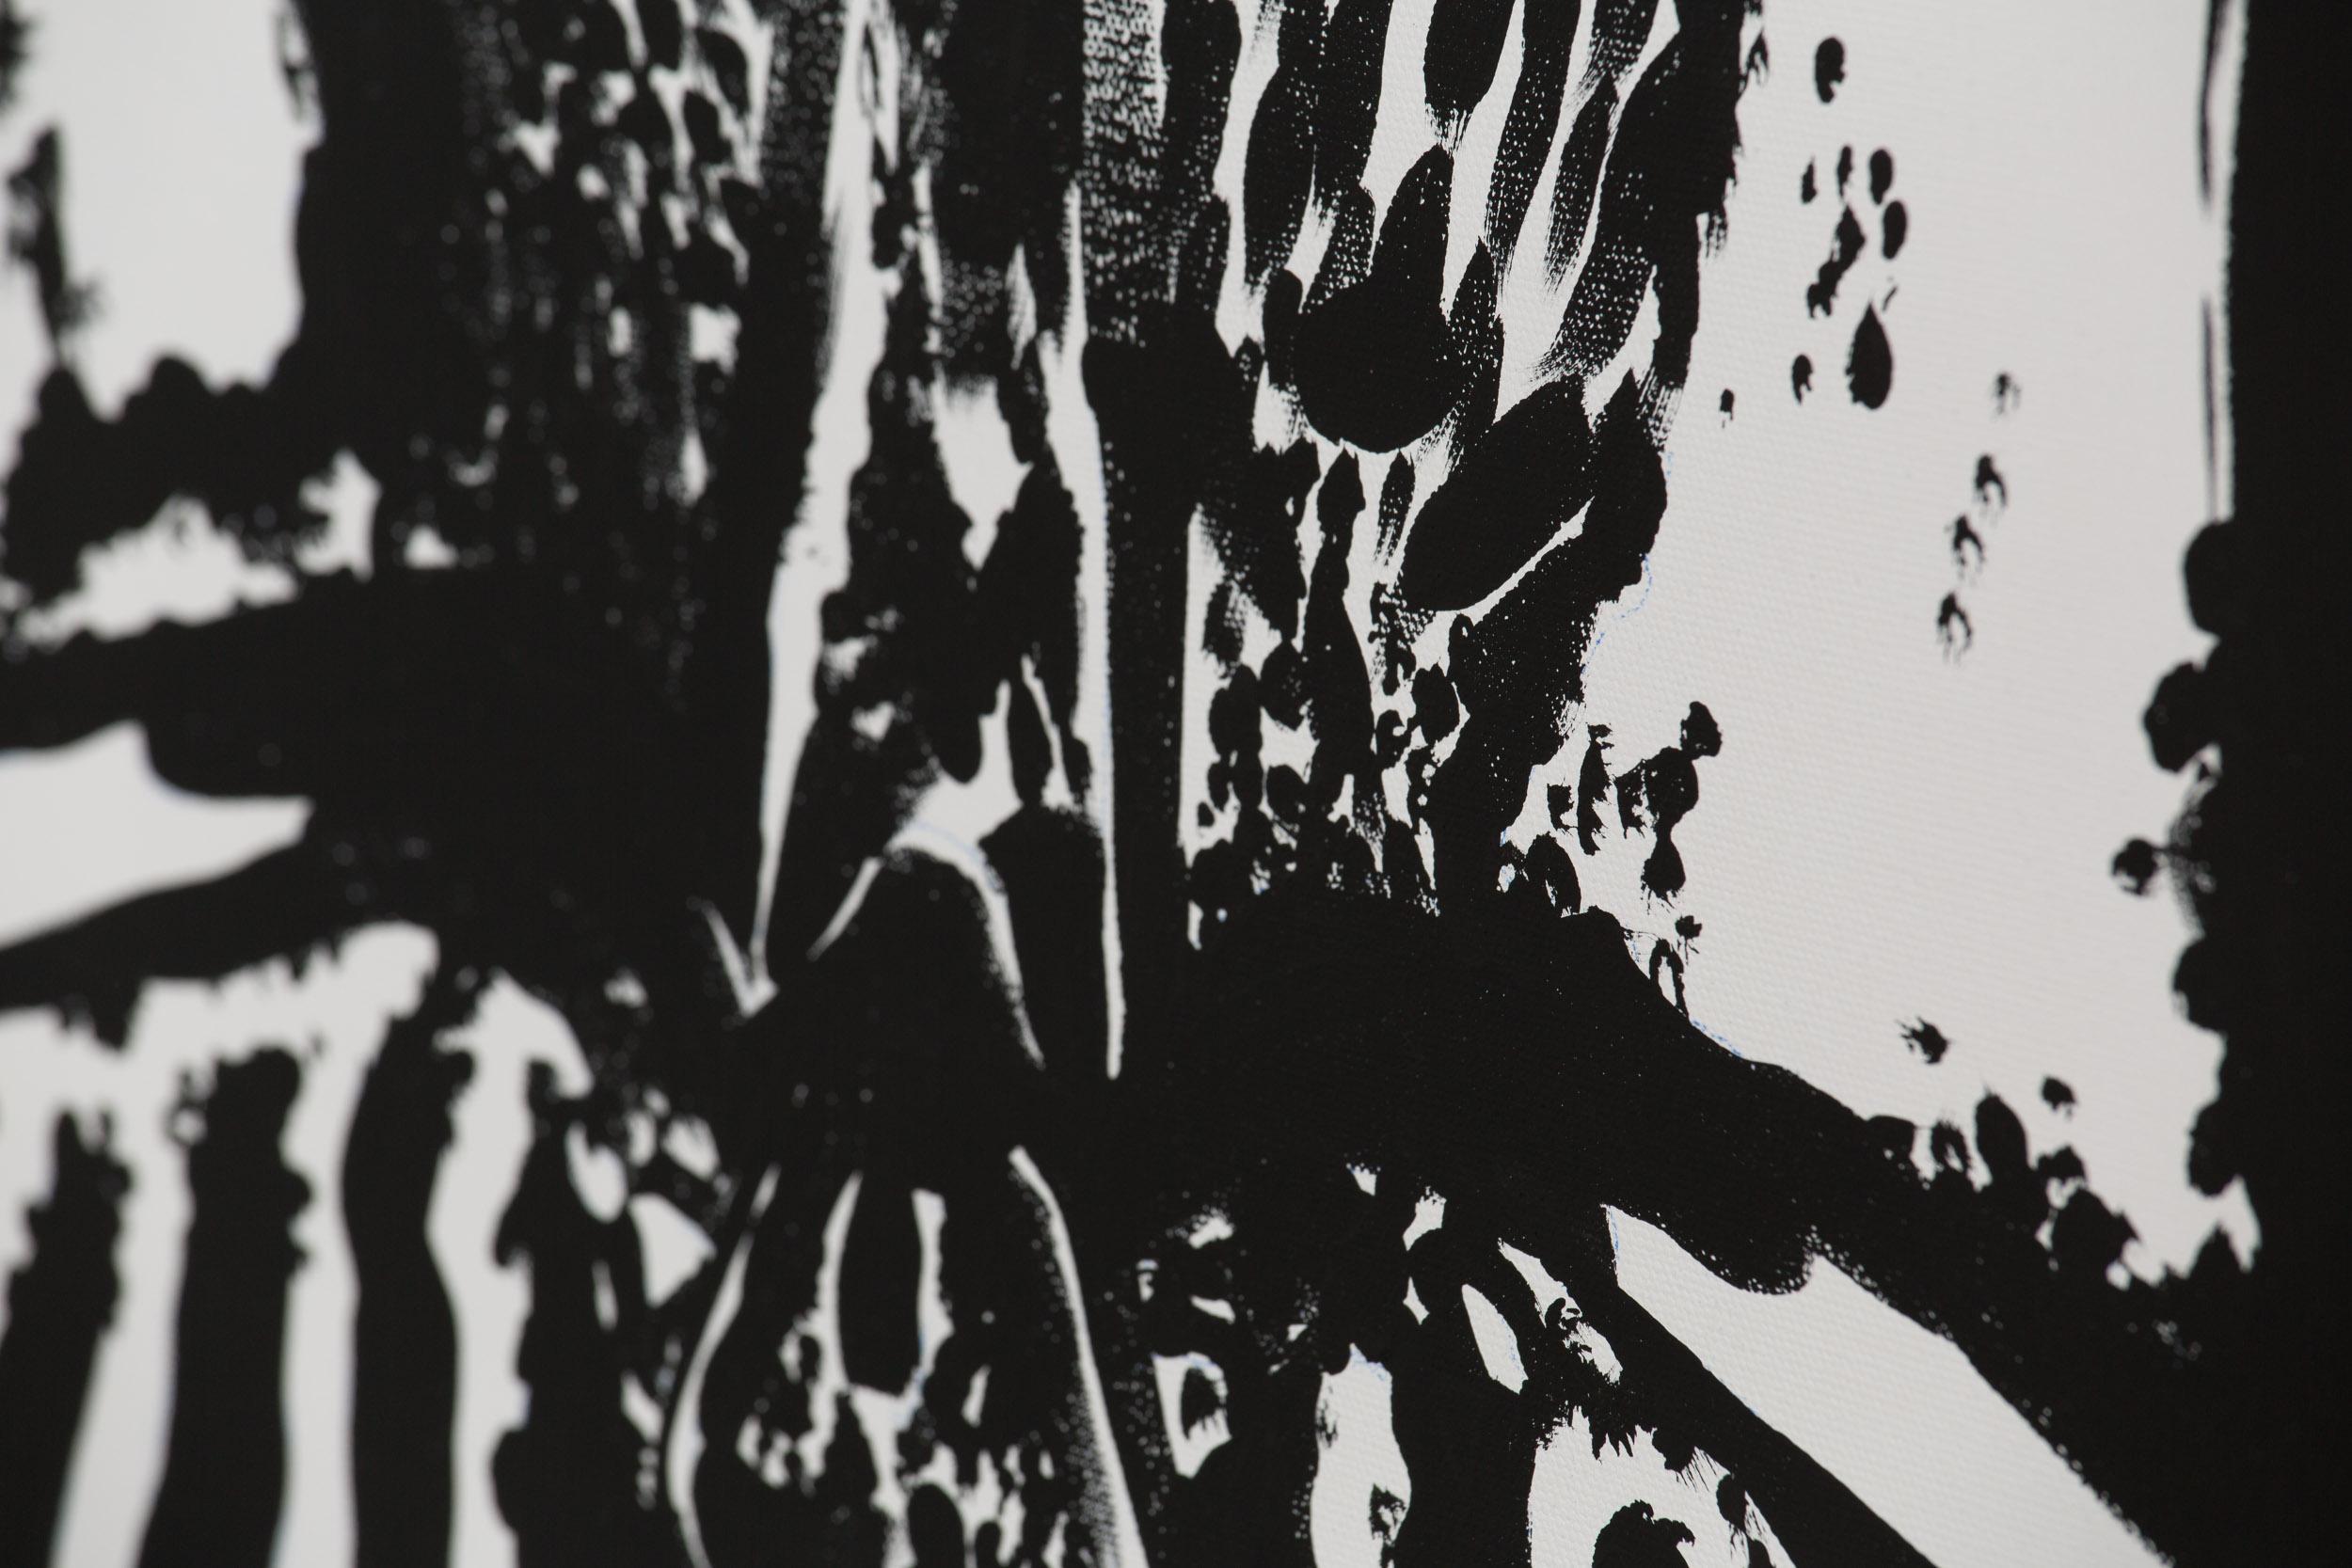 Carapace V [DETAIL]